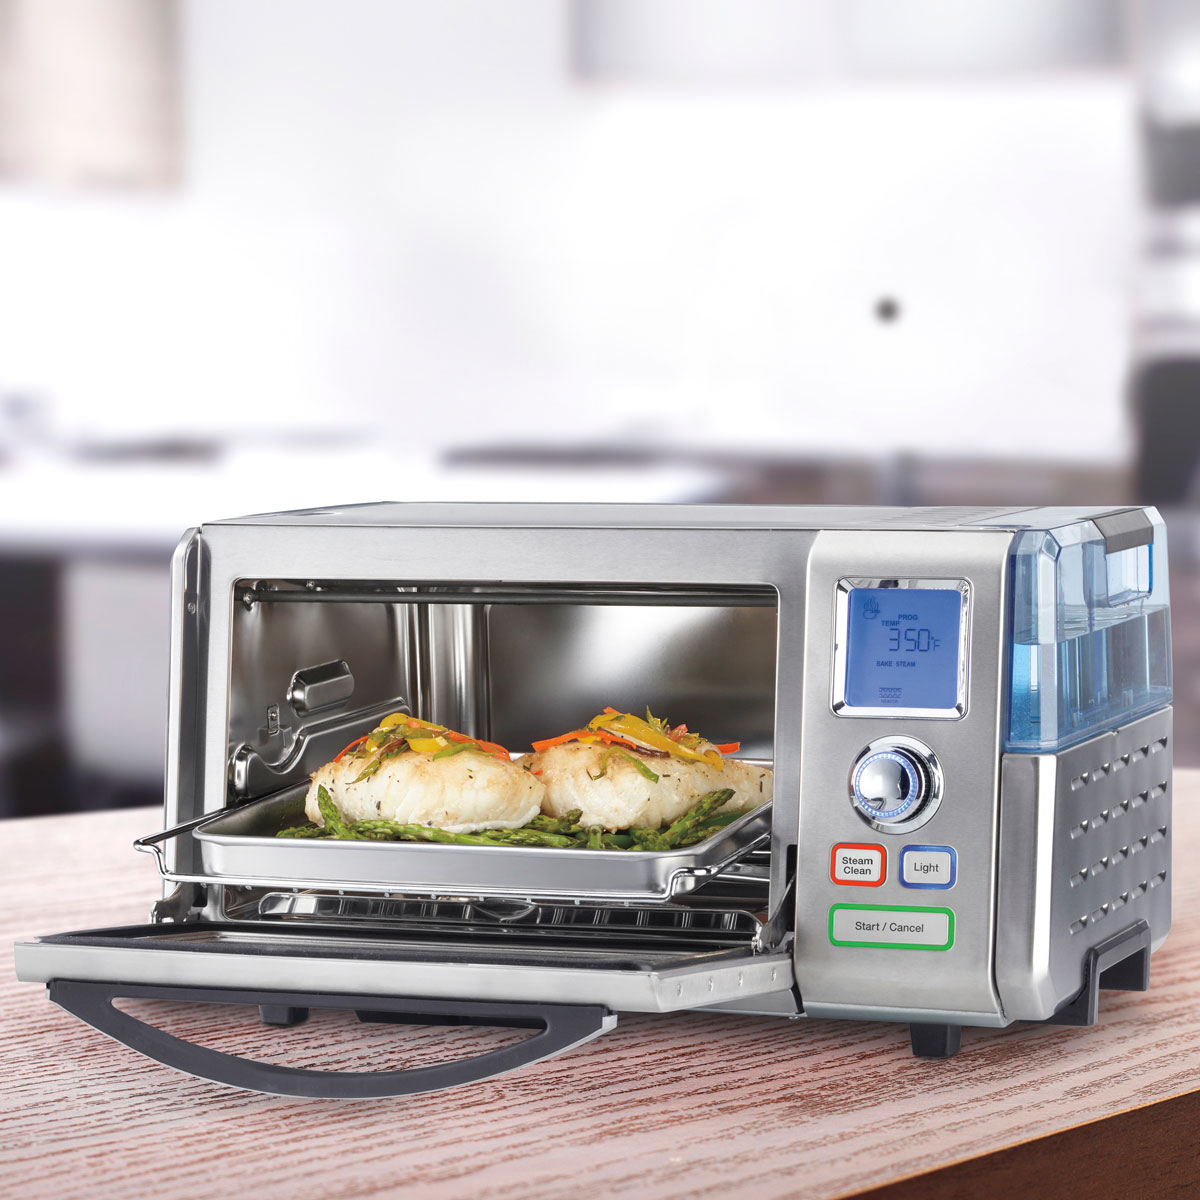 bo Steam Convection Oven